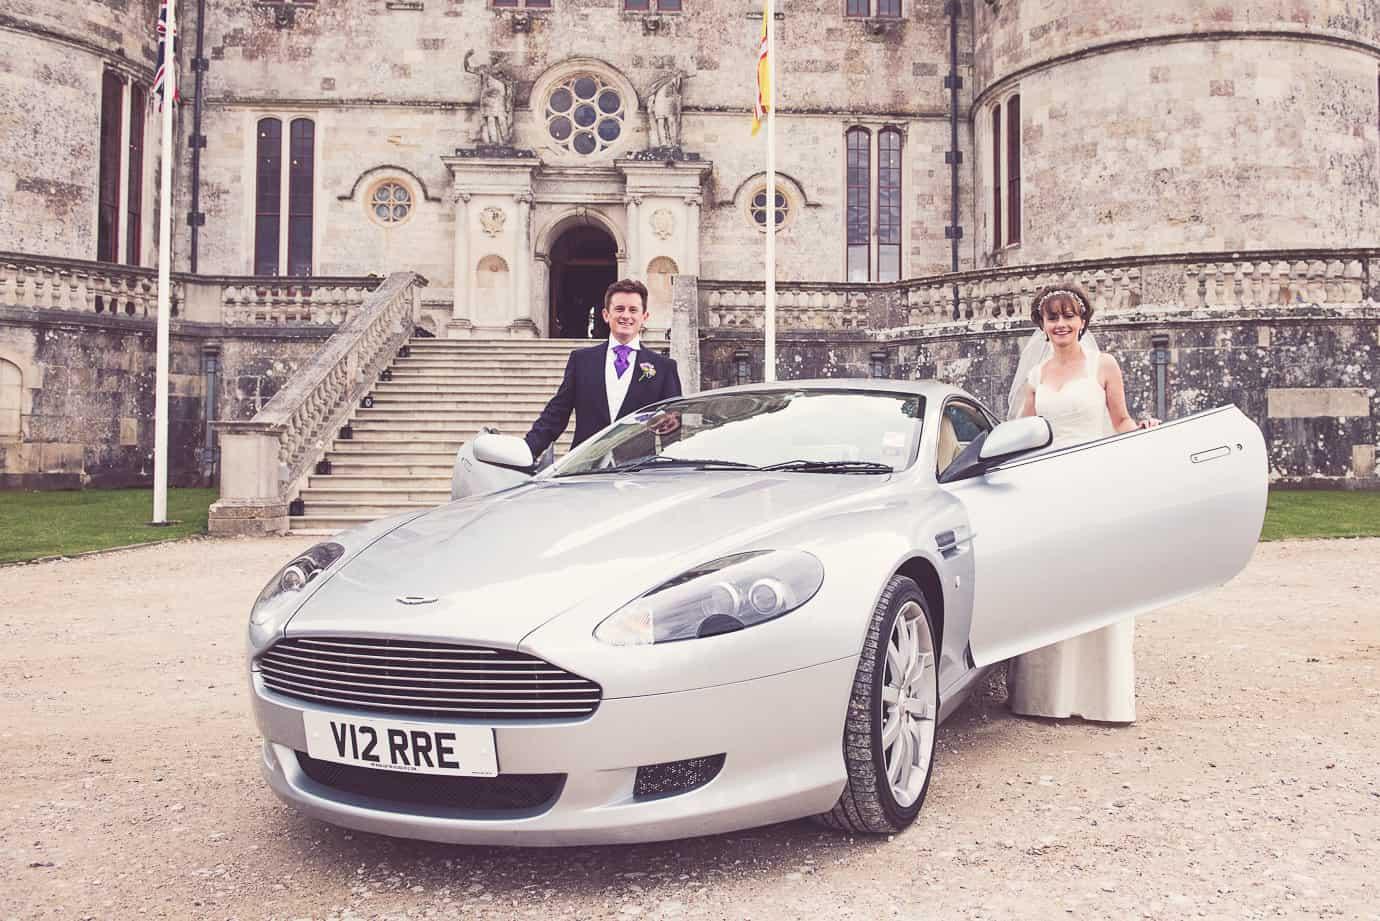 Aston Martin DB9 wedding car at Lulworth Castle wedding venue in Dorset